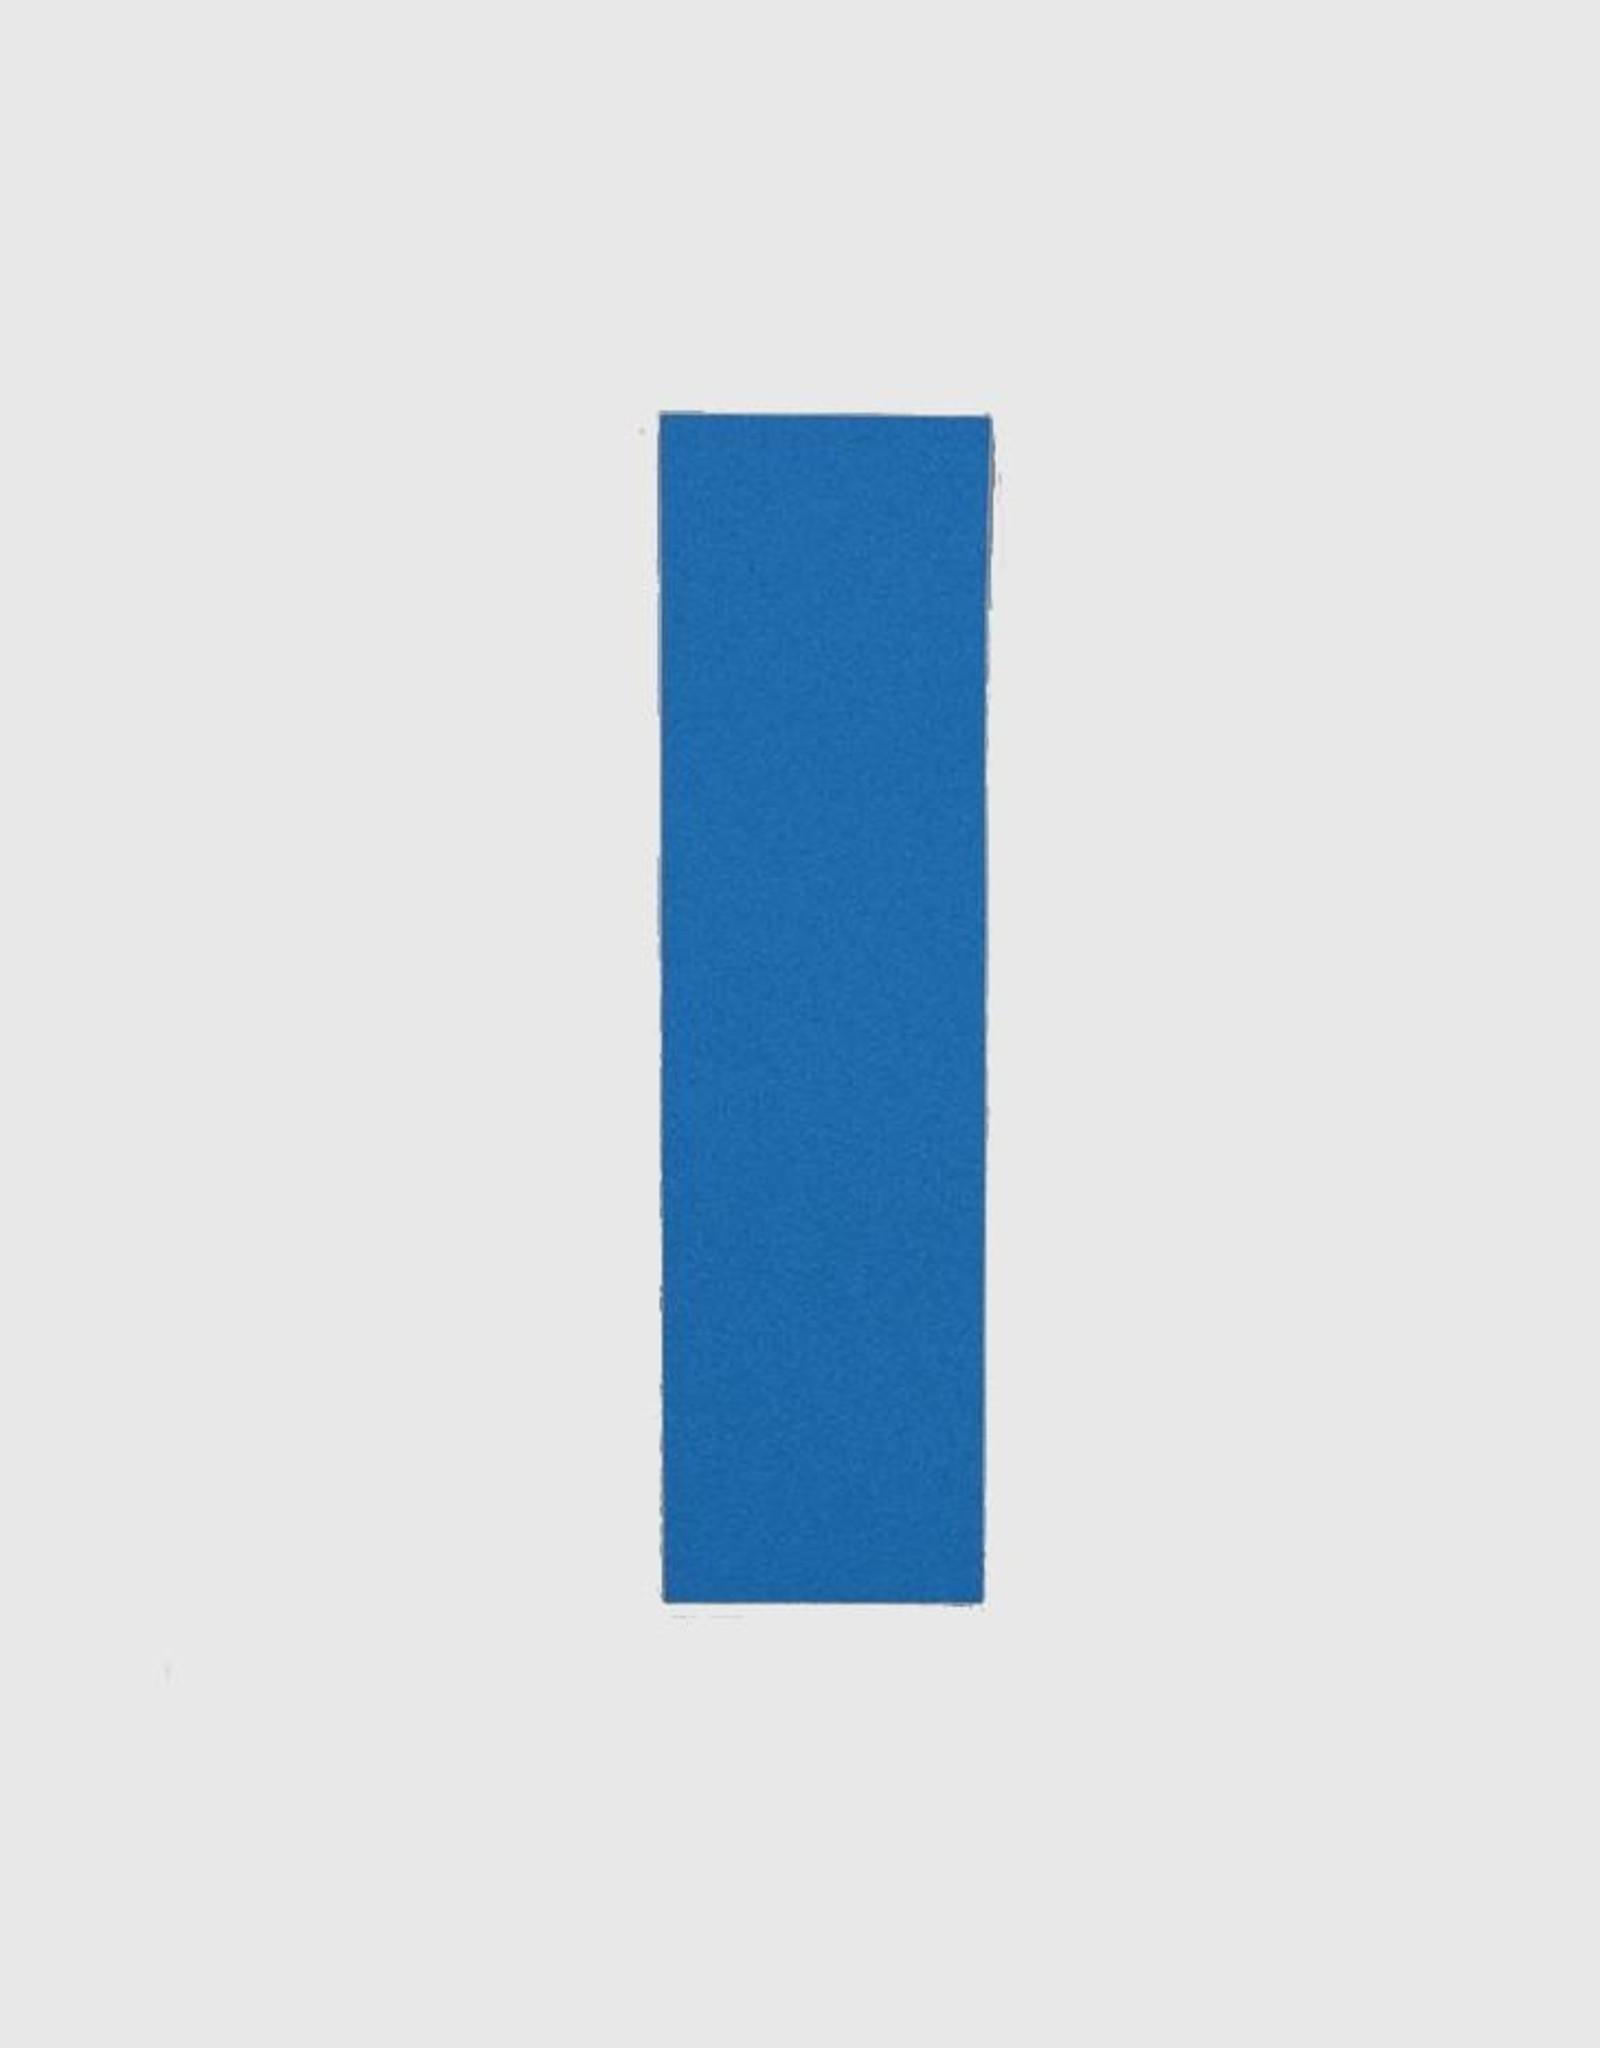 JESSUP JESSUP GRIP SHEET (SINGLE) - LIGHT BLUE (9)